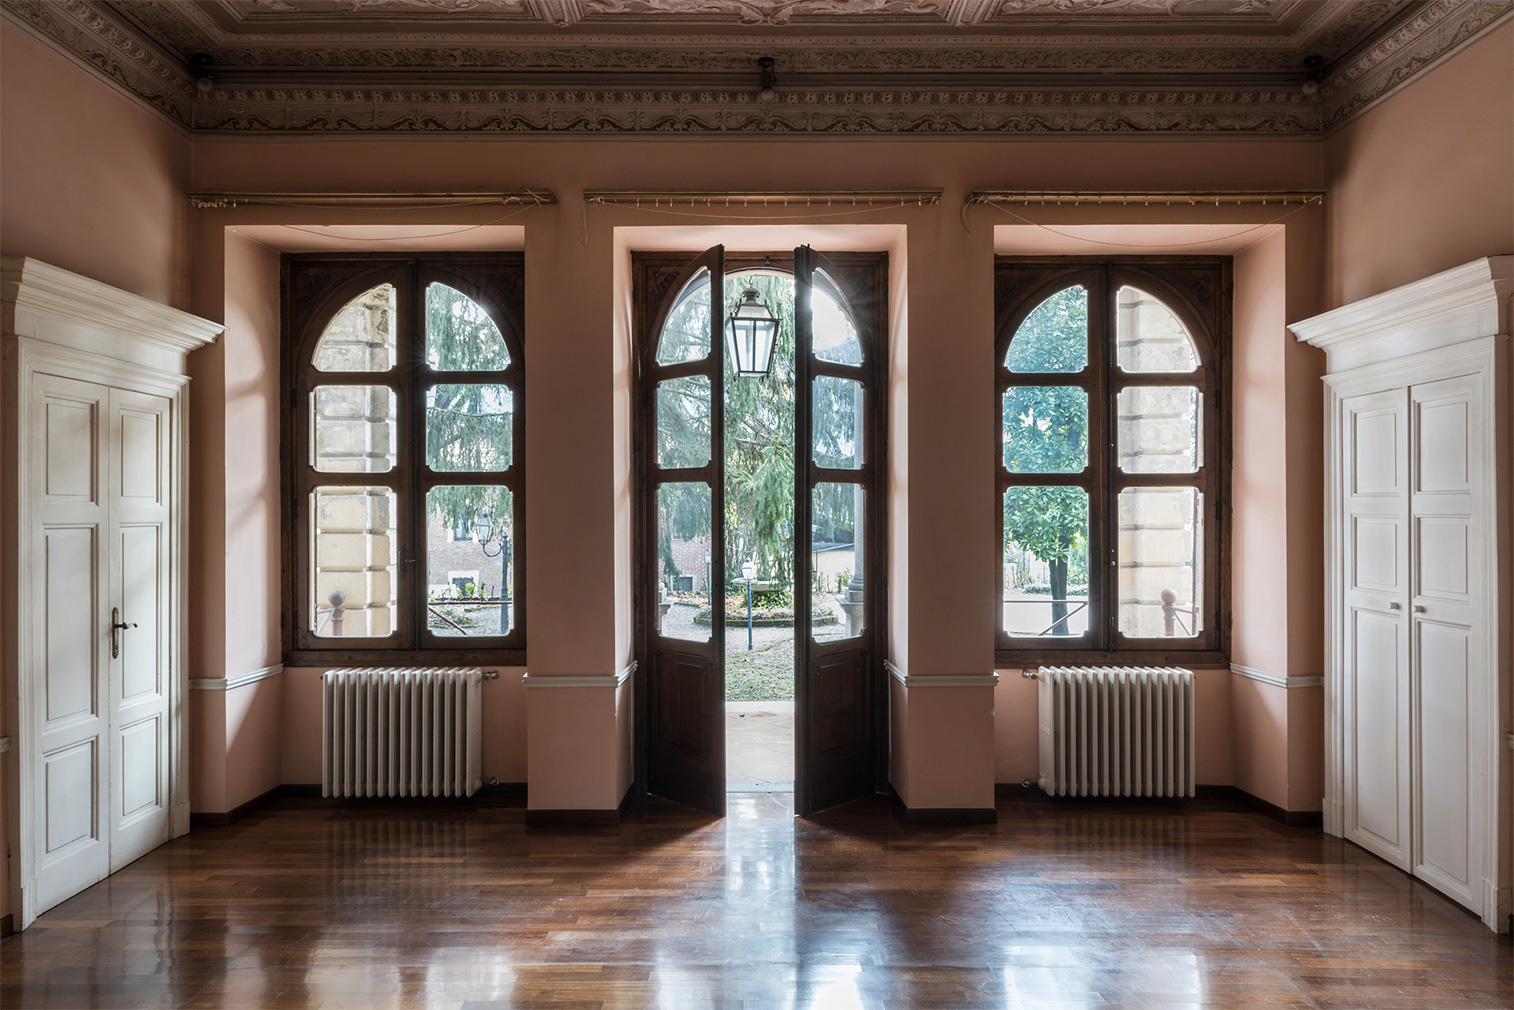 Italian palazzo for sale